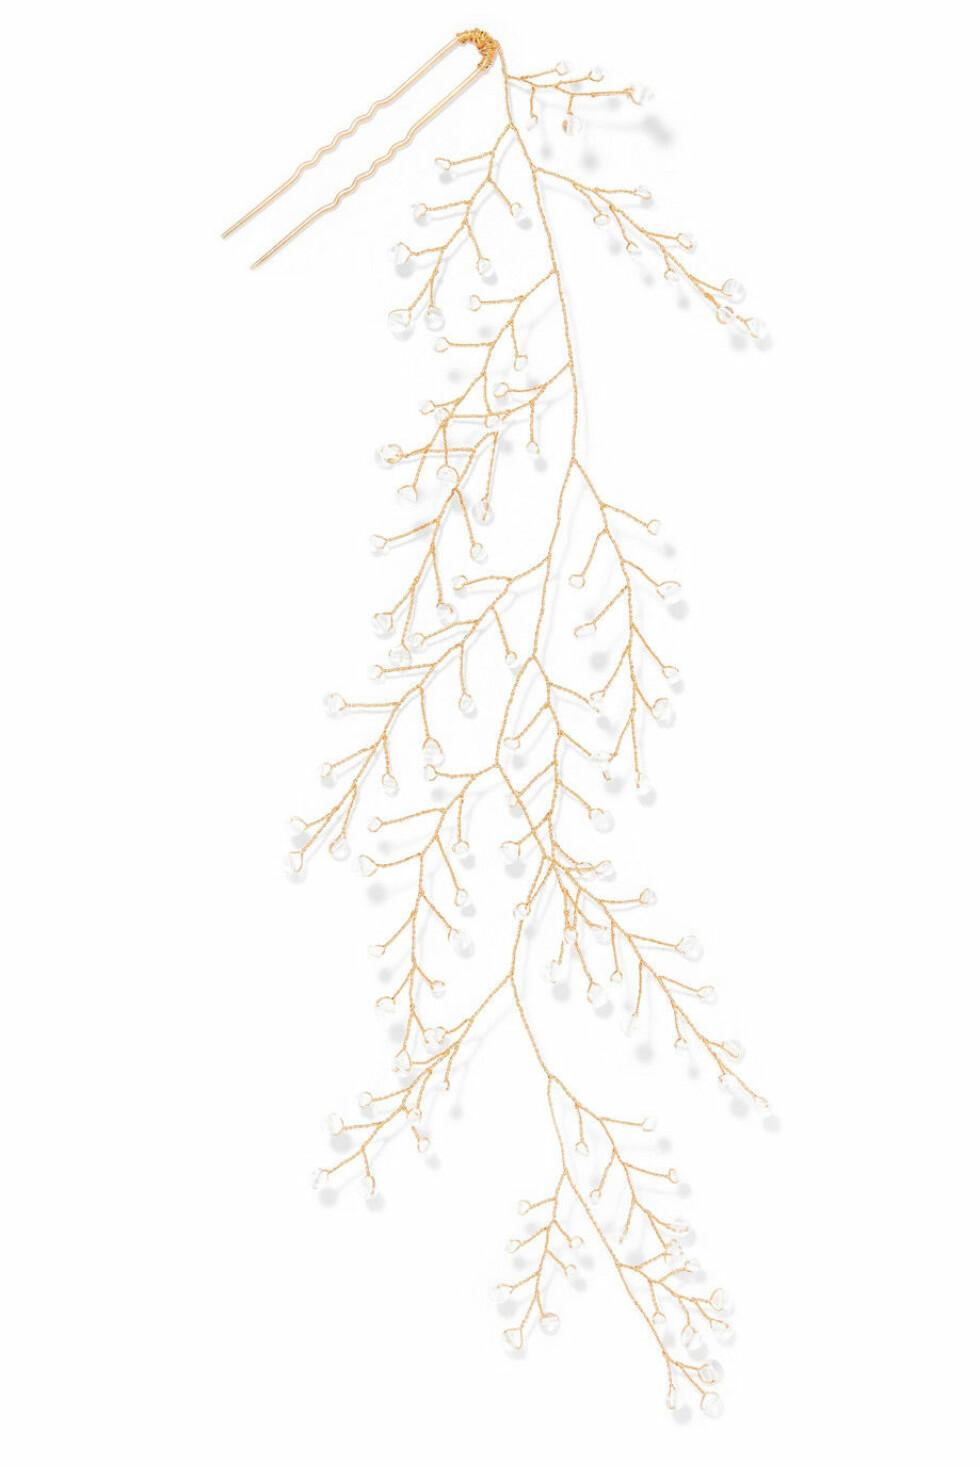 15 /quatorze |1800,-| https://www.net-a-porter.com/no/en/product/1097382/14___quatorze/dewdrop-gold-tone-crystal-hair-pin